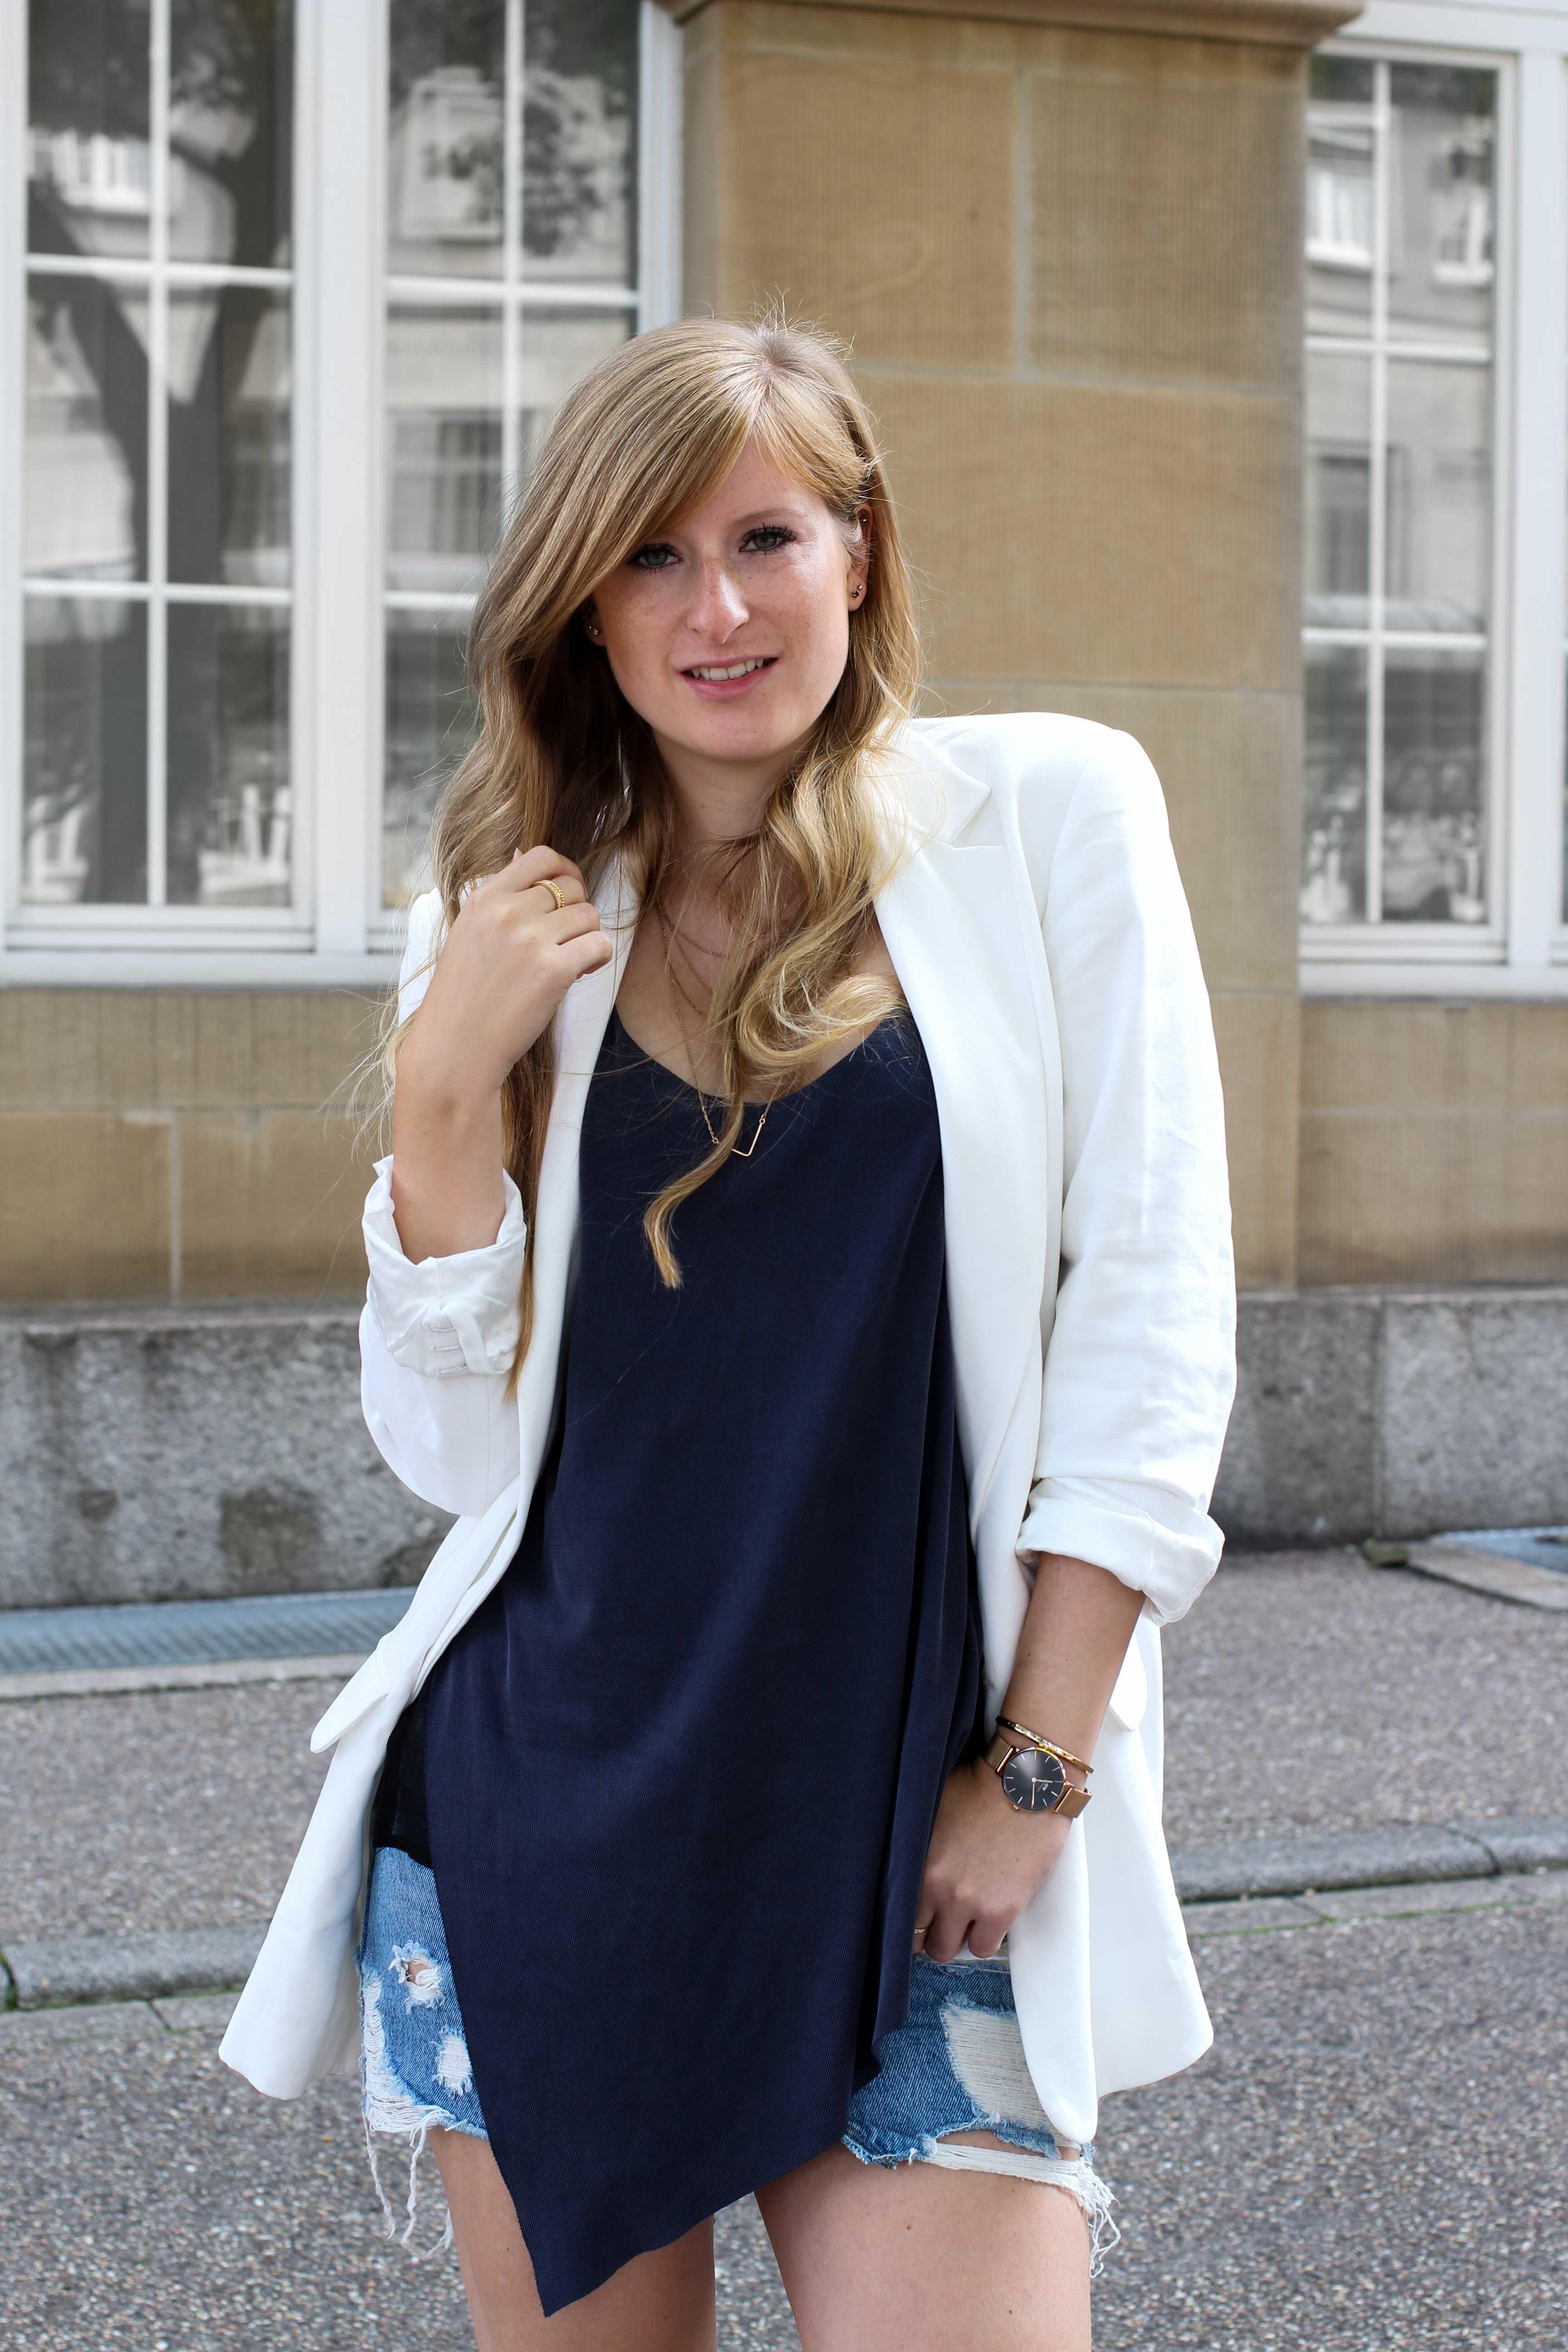 Spätsommeroutfit Zara Jeansrock kombinieren weißer Longblazer Zara Modeblog Streetstyle Outfit Karlsruhe